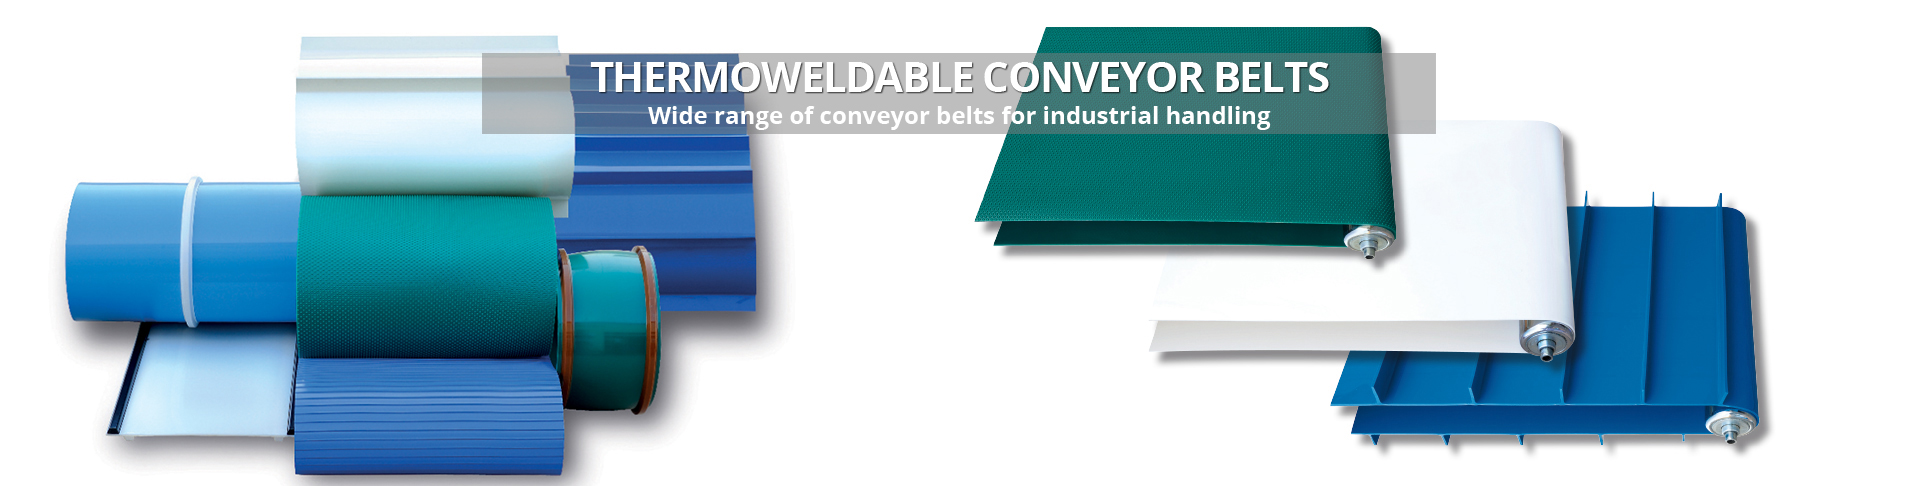 wide-range-of-conveyor-belts-slide